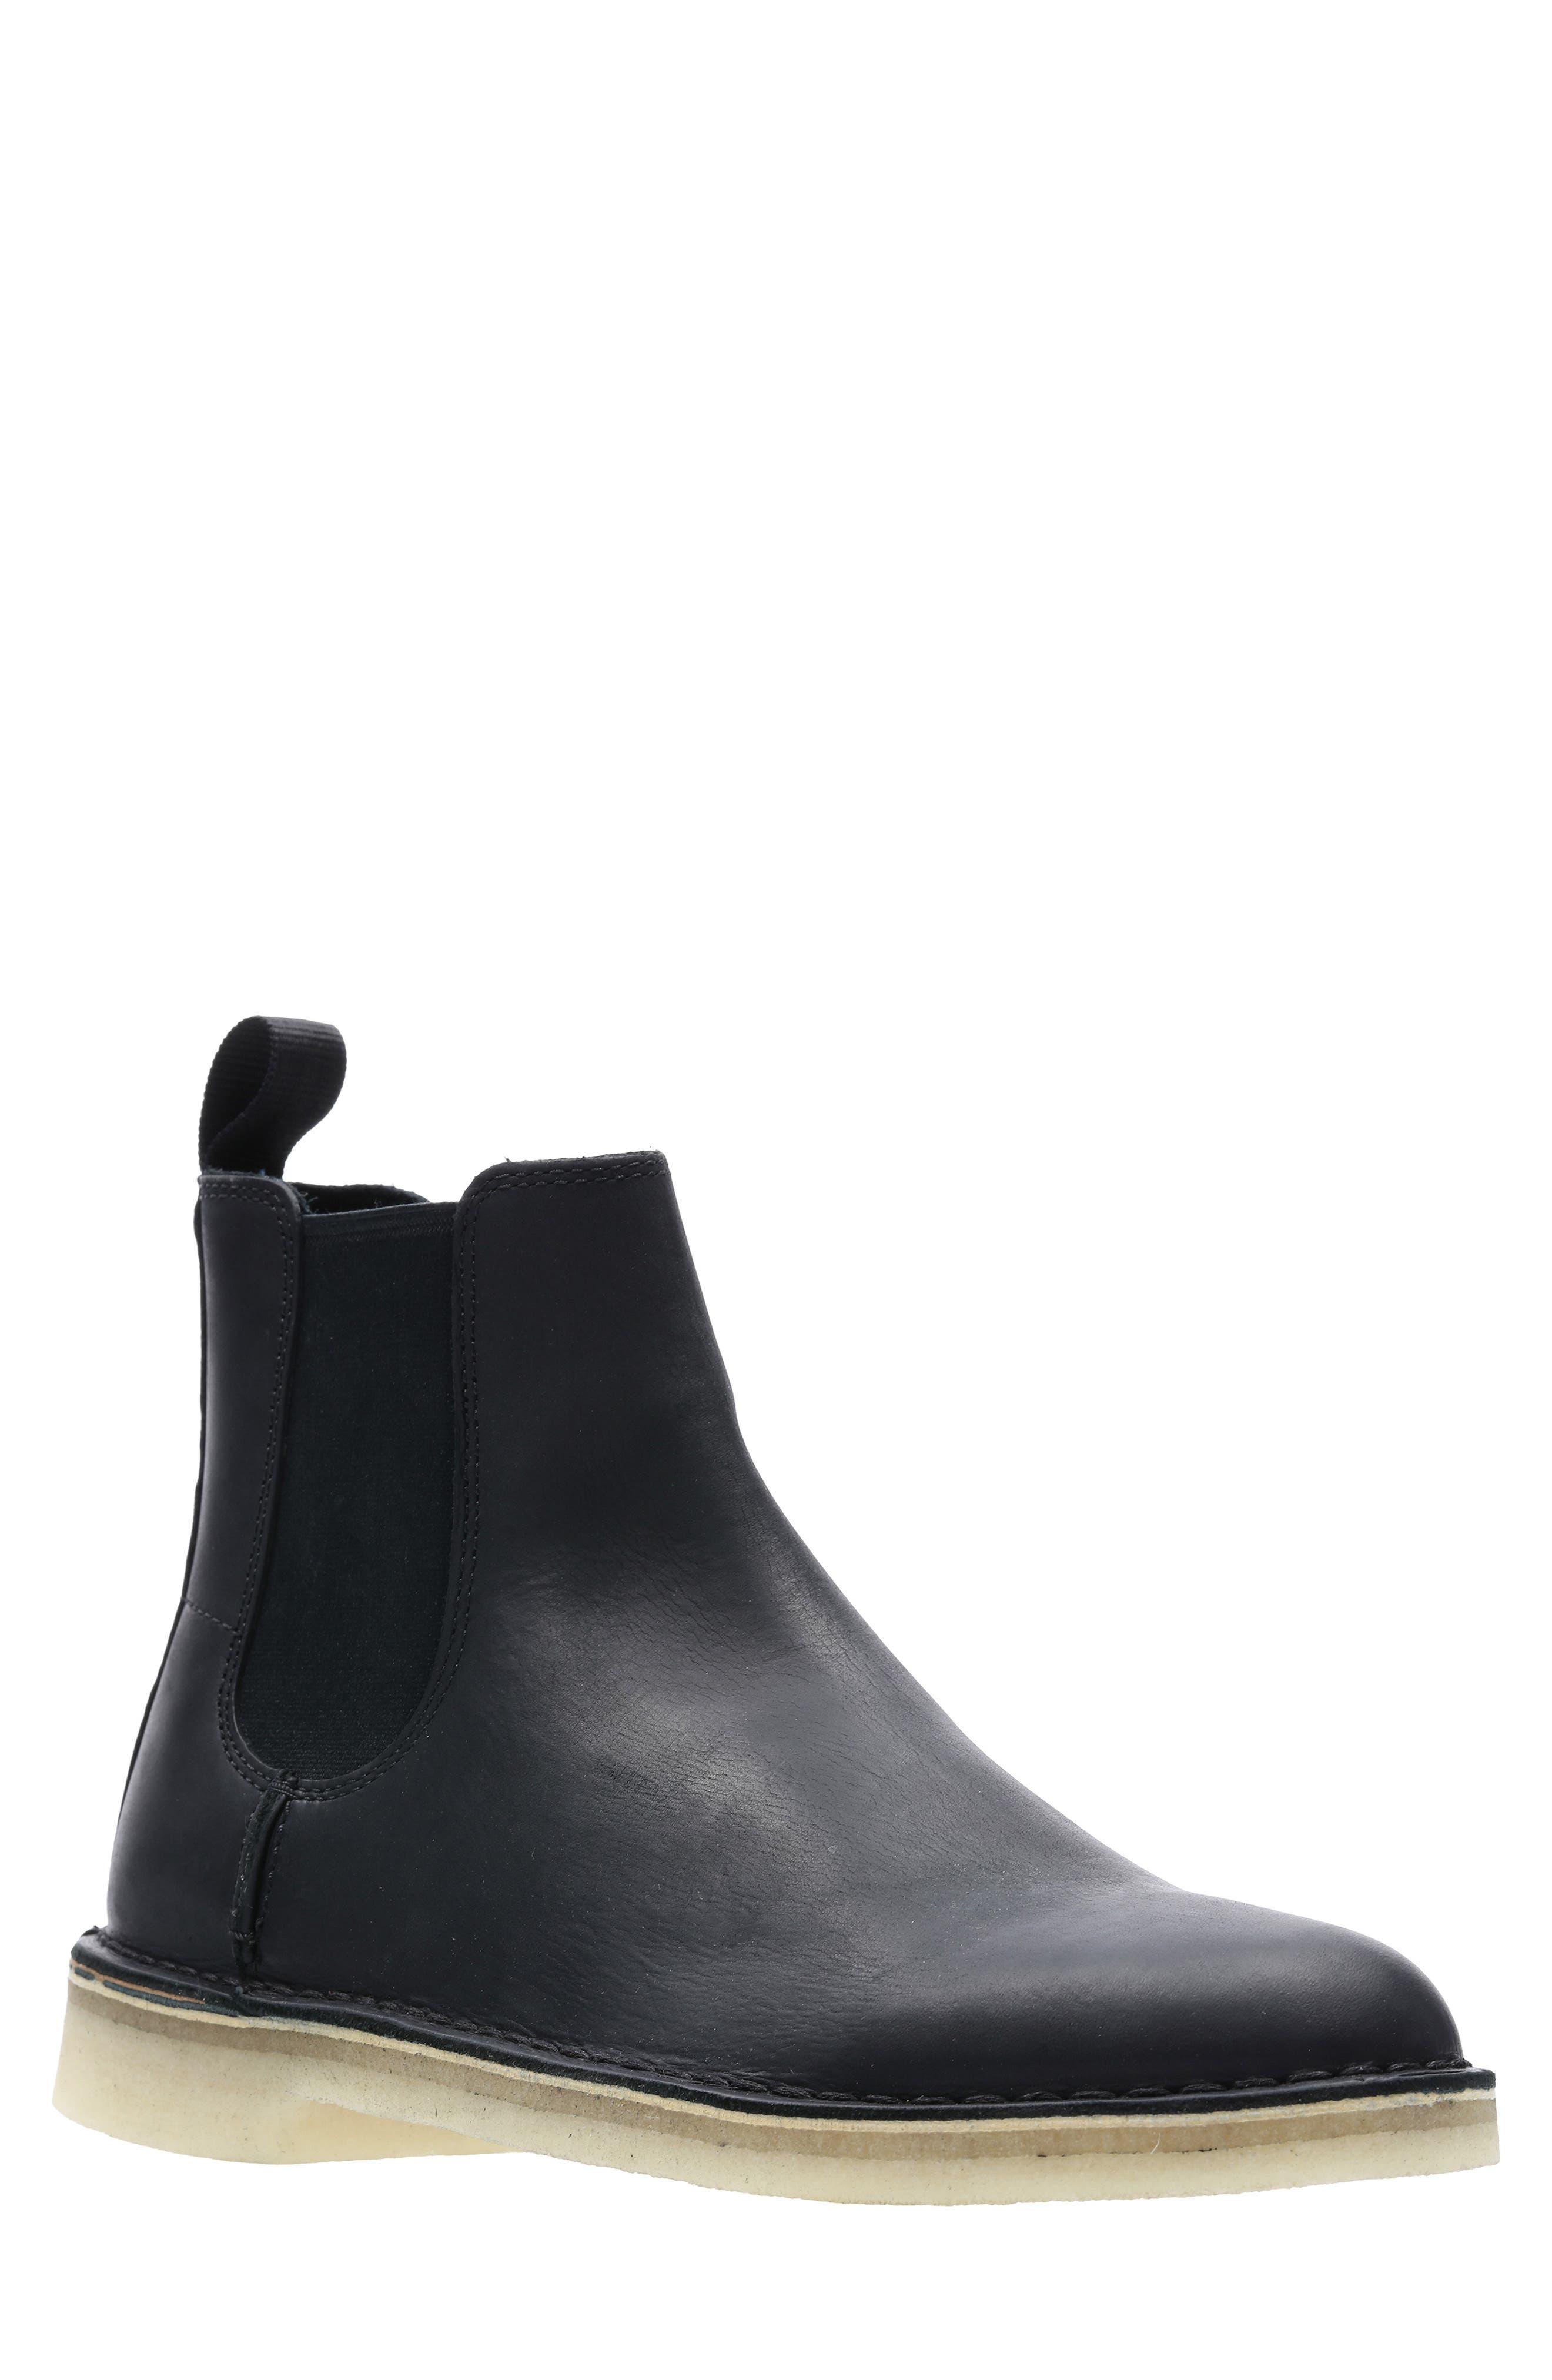 Desert Peak Chelsea Boot,                             Main thumbnail 1, color,                             BLACK/BLACK LEATHER